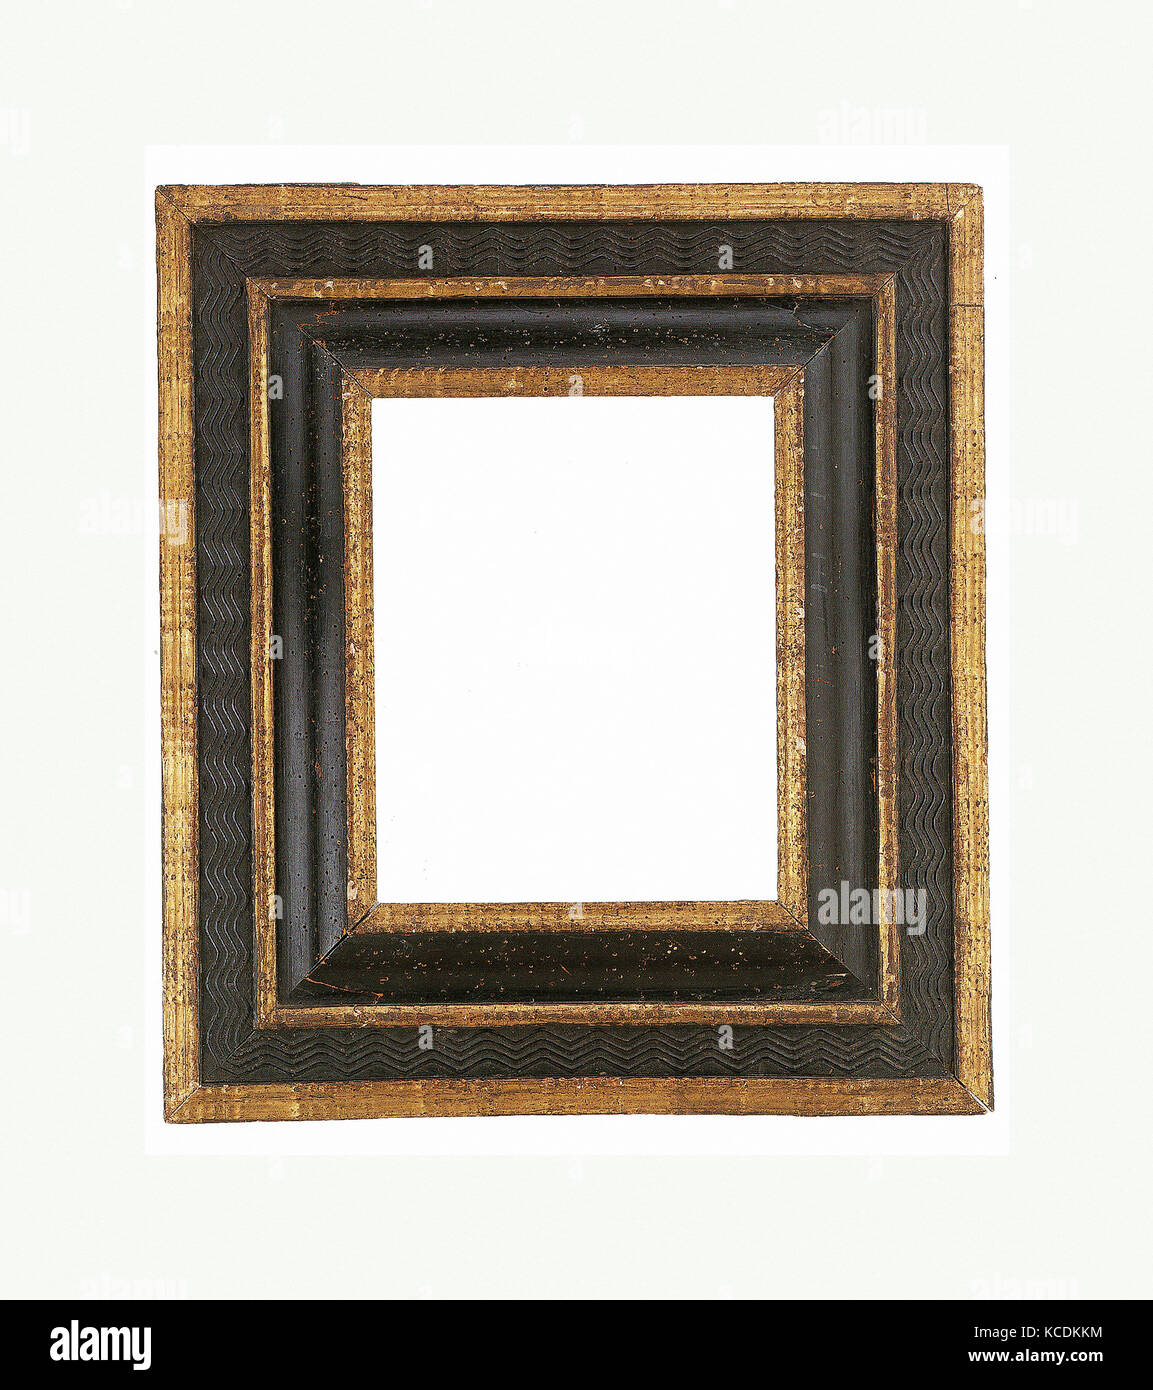 Beste Scheune Framing Bilder - Rahmen Ideen - markjohnsonshow.info